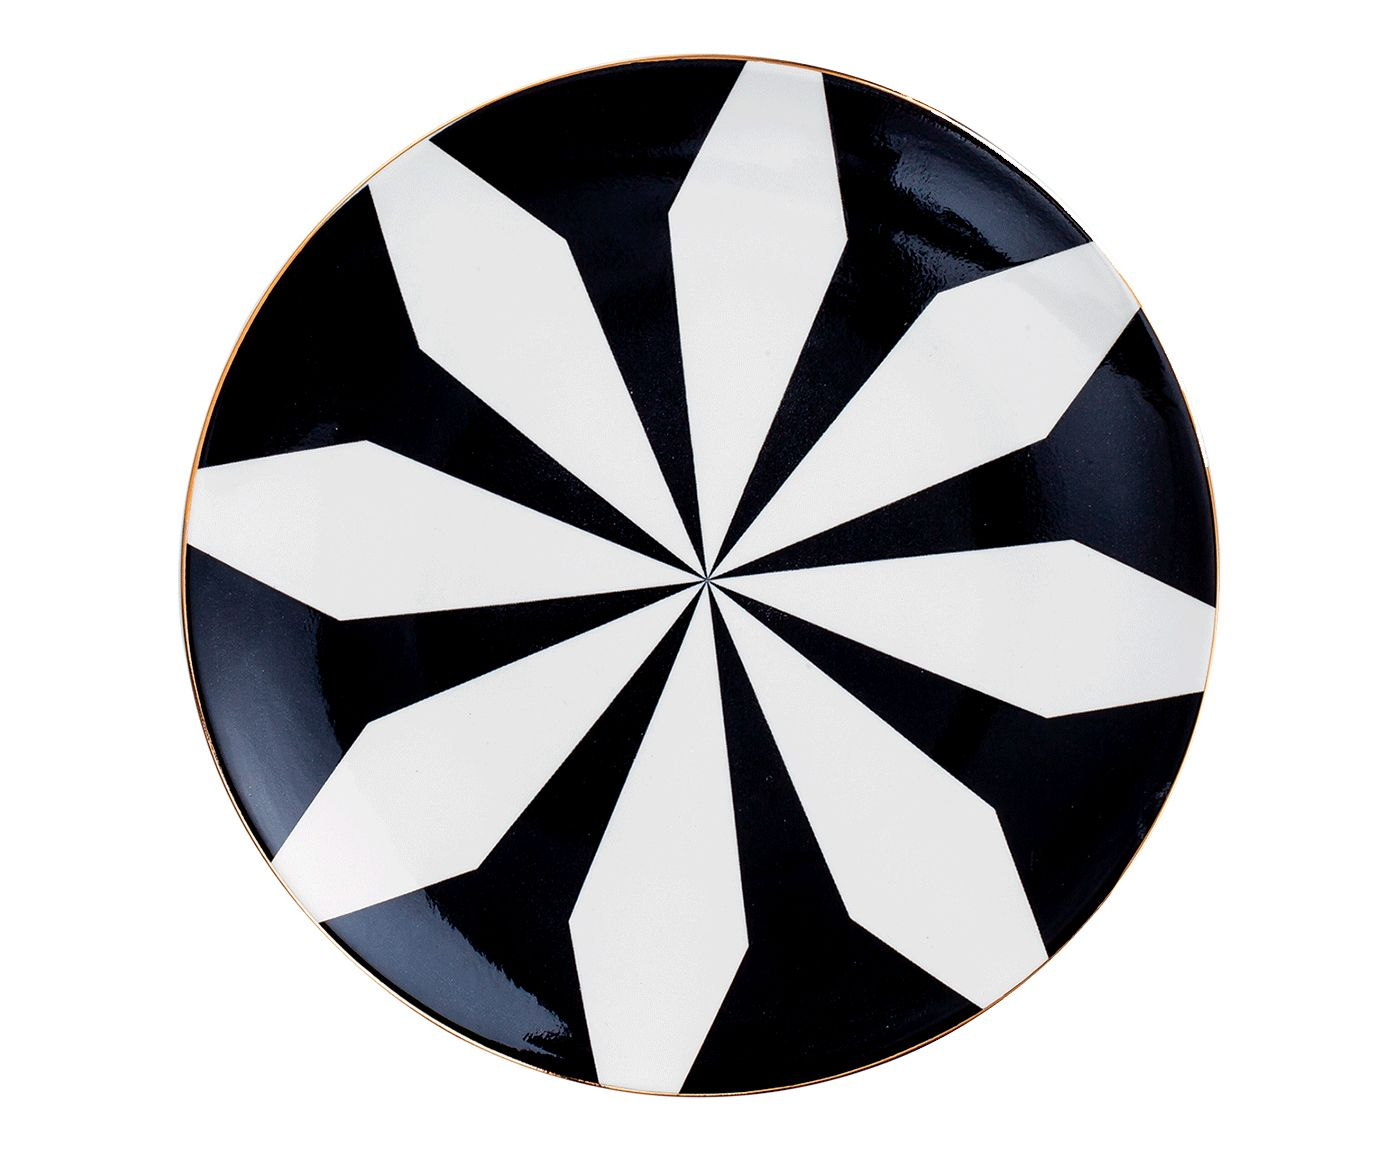 Prato Decorativo Guadalupe - 22cm   Westwing.com.br